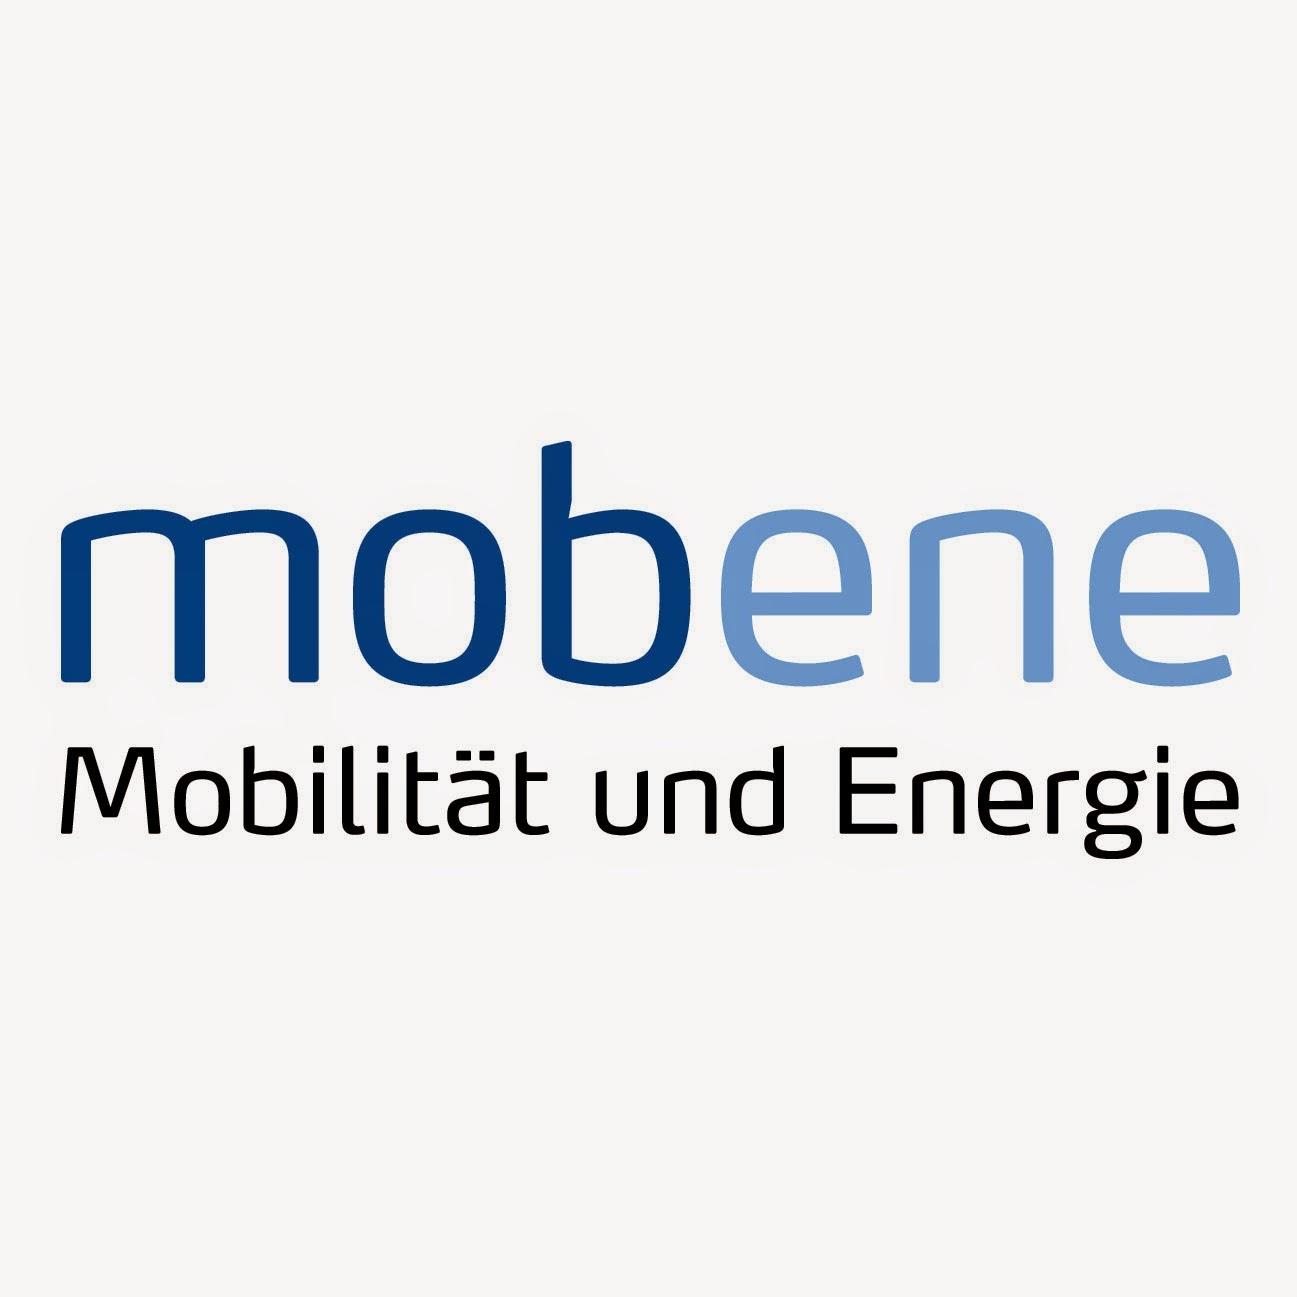 Mobene GmbH & Co. KG